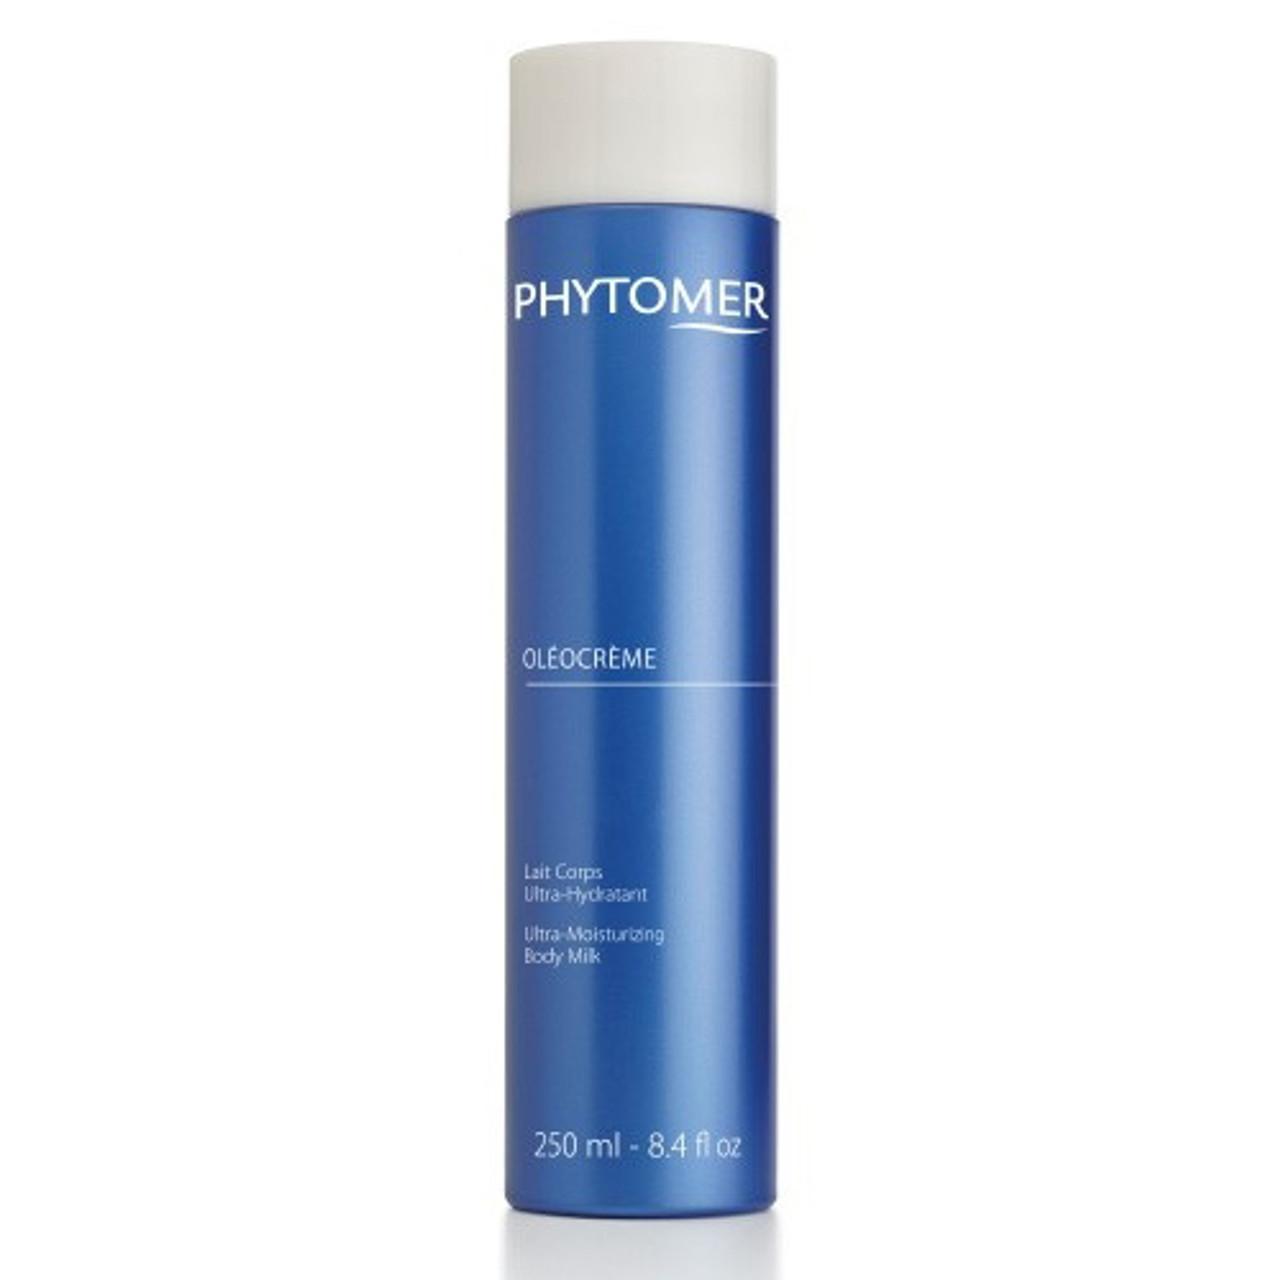 Phytomer Oleocreme Ultra-Moisturizing Body Milk BeautifiedYou.com